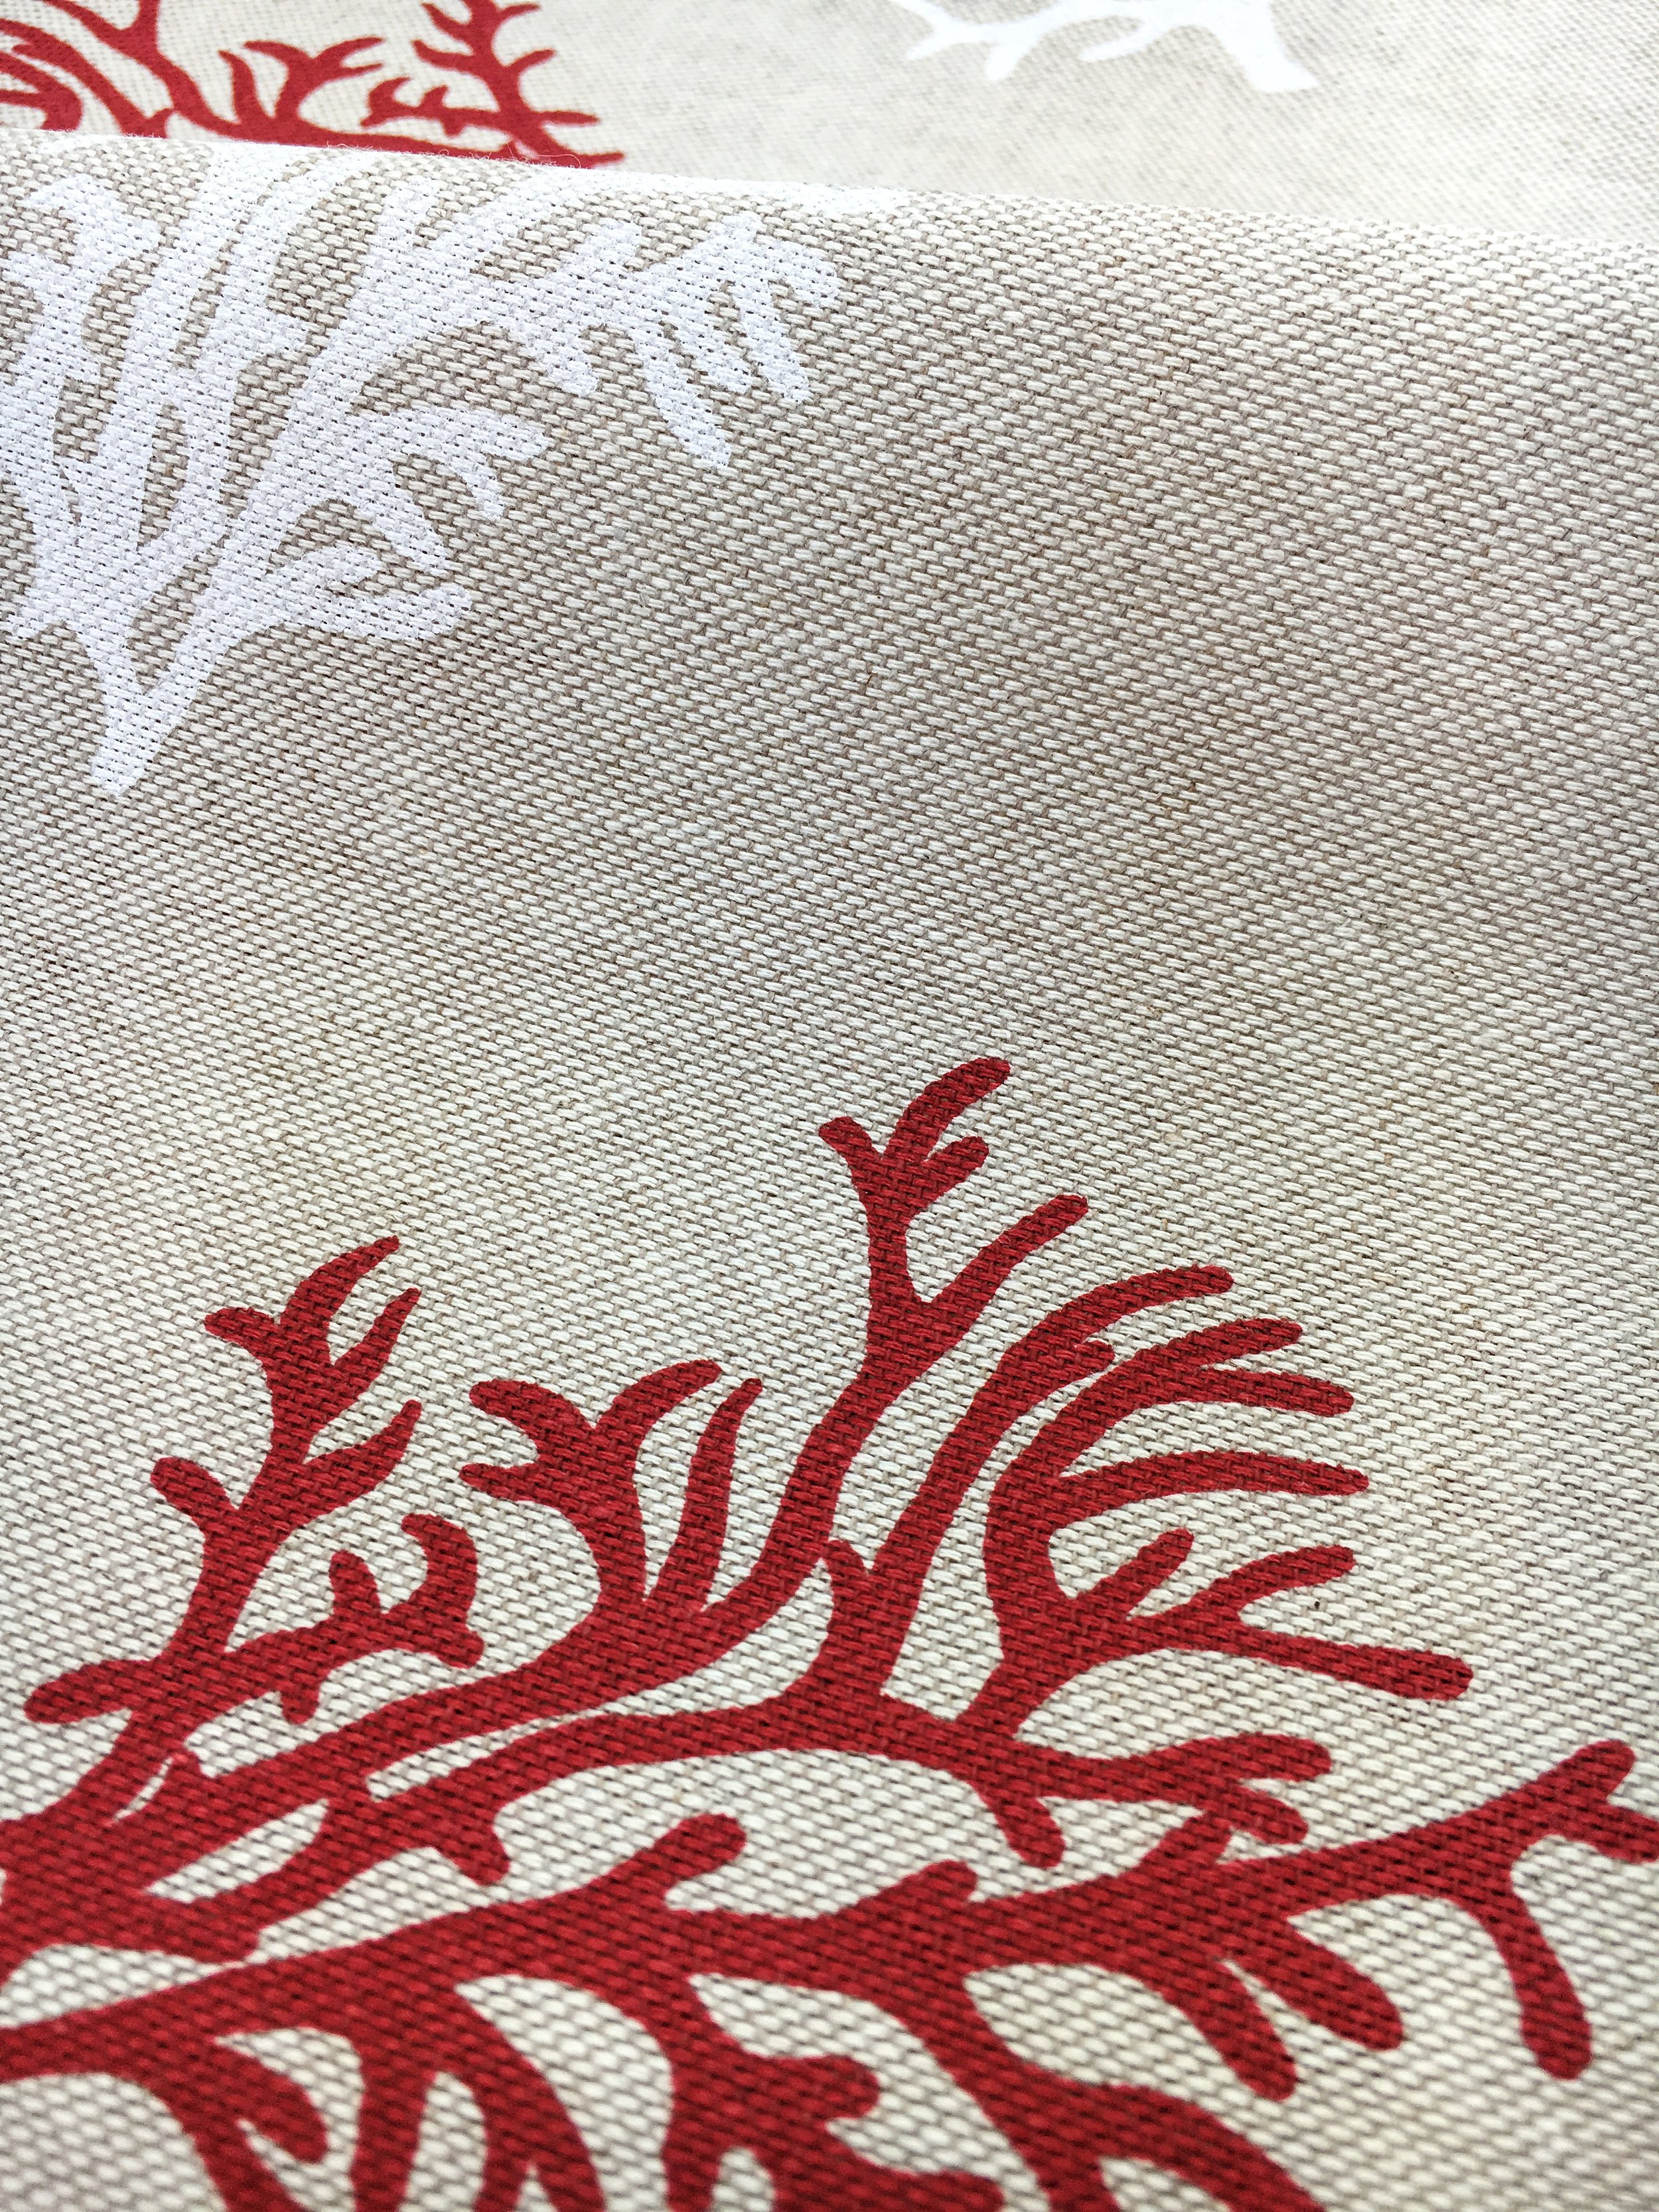 CottonFabricRWTrees4.jpg